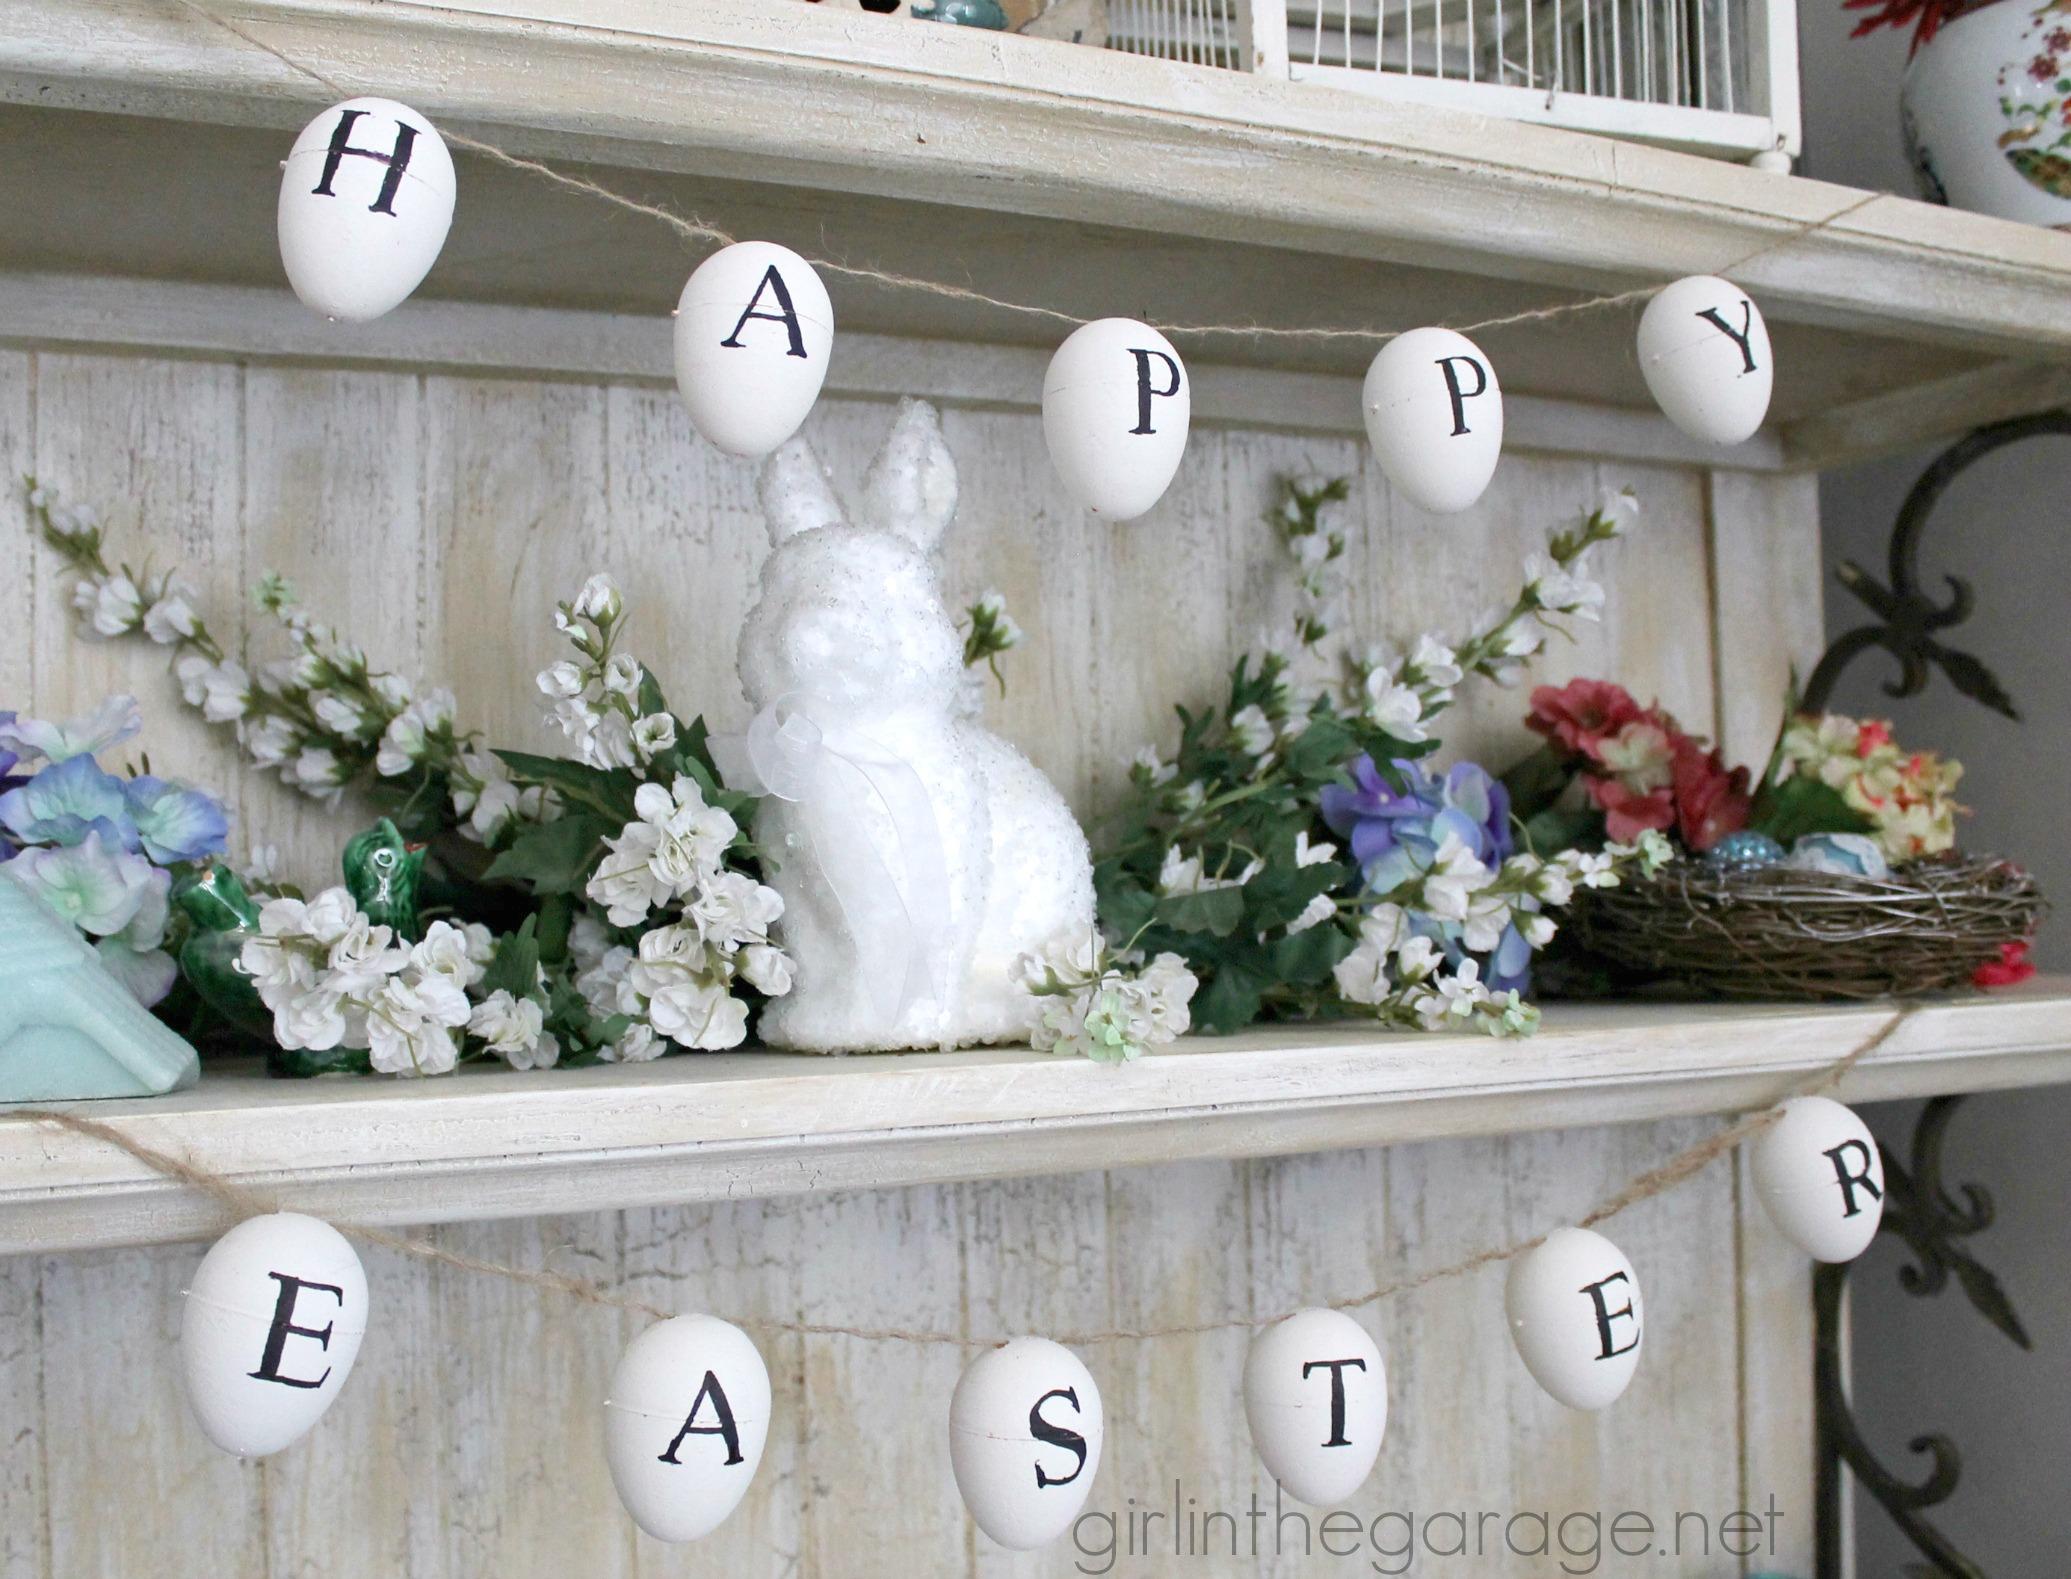 easter egg garland inspired by ballard designs easter craft and easter egg garland inspired by ballard designs easter craft and decor showcase girlinthegarage